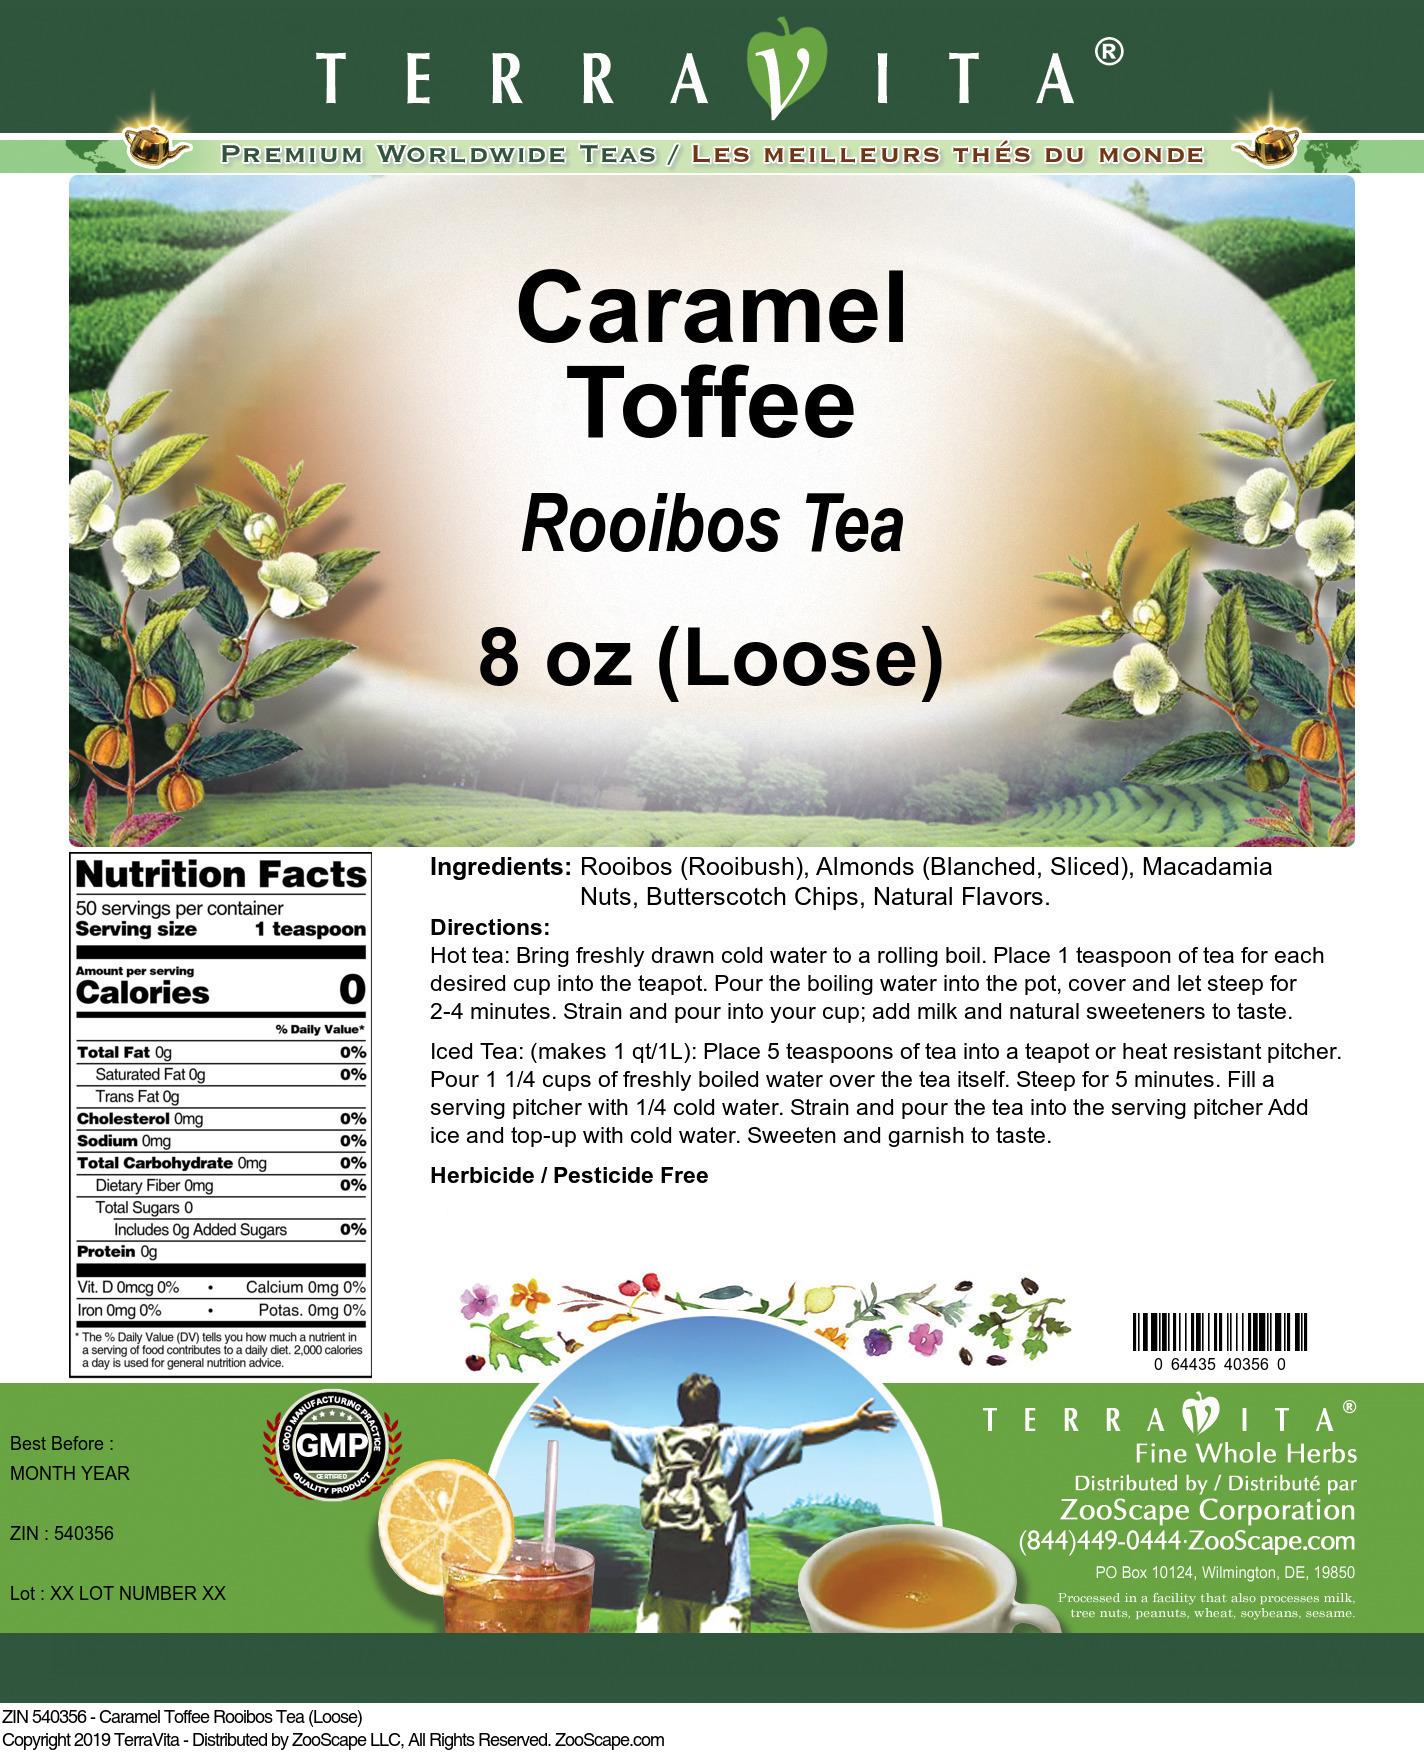 Caramel Toffee Rooibos Tea